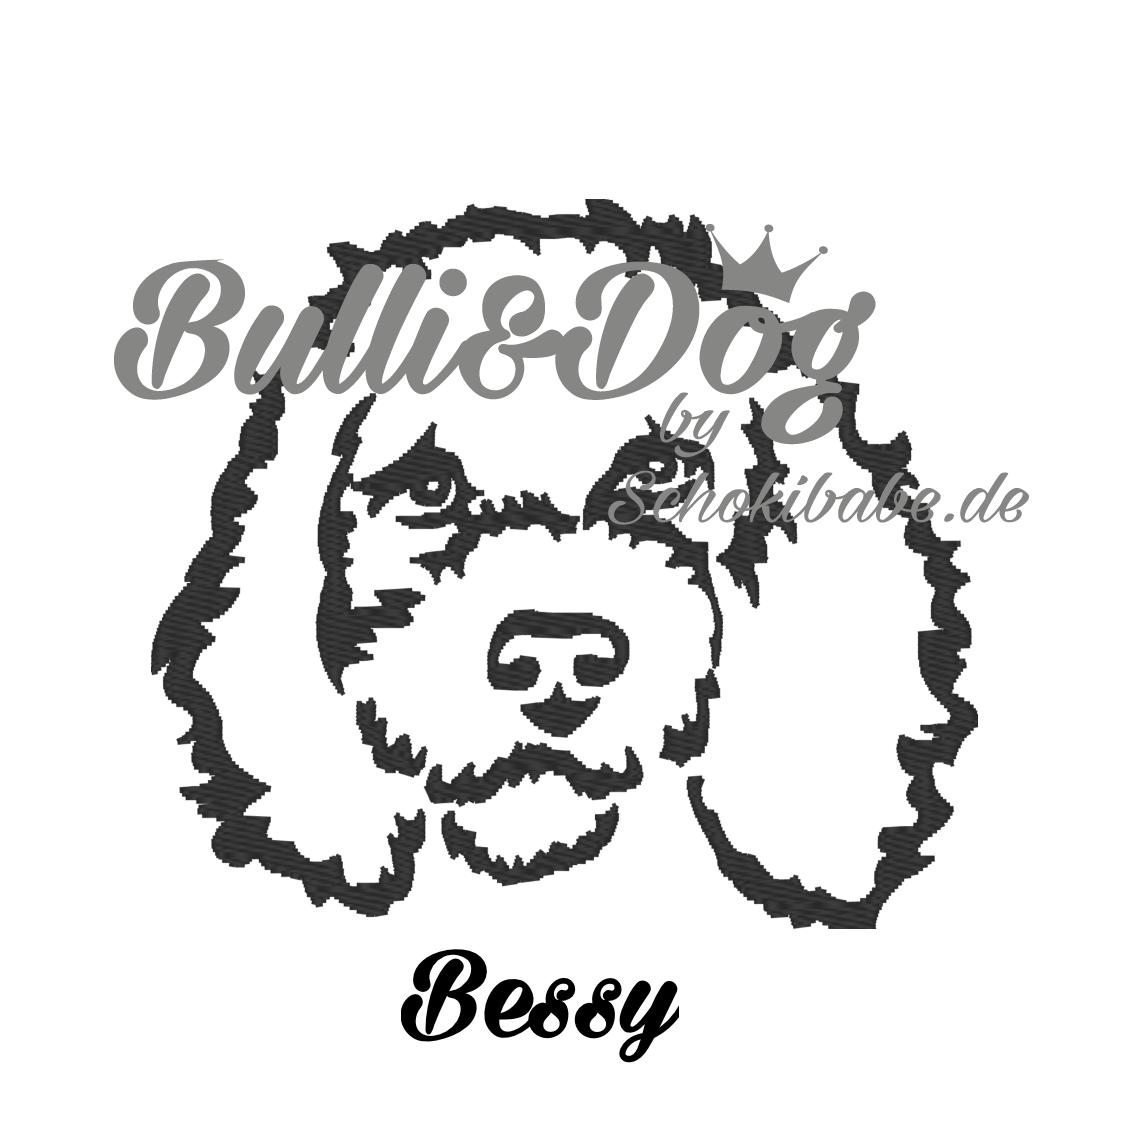 Bessy_7x6-Kopie5b5c227ed334c